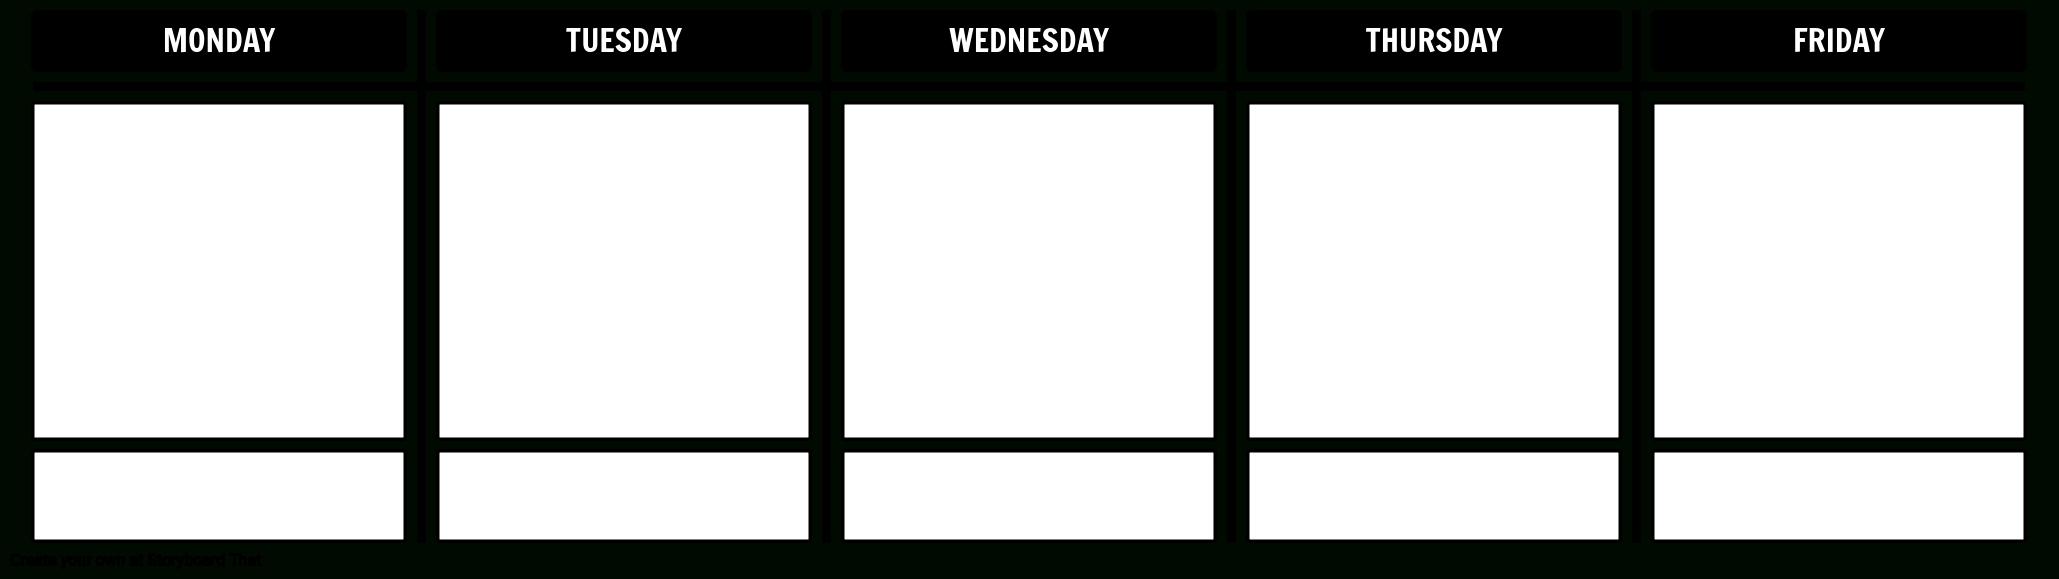 Days Of The Week Storyboardstoryboard-Templates